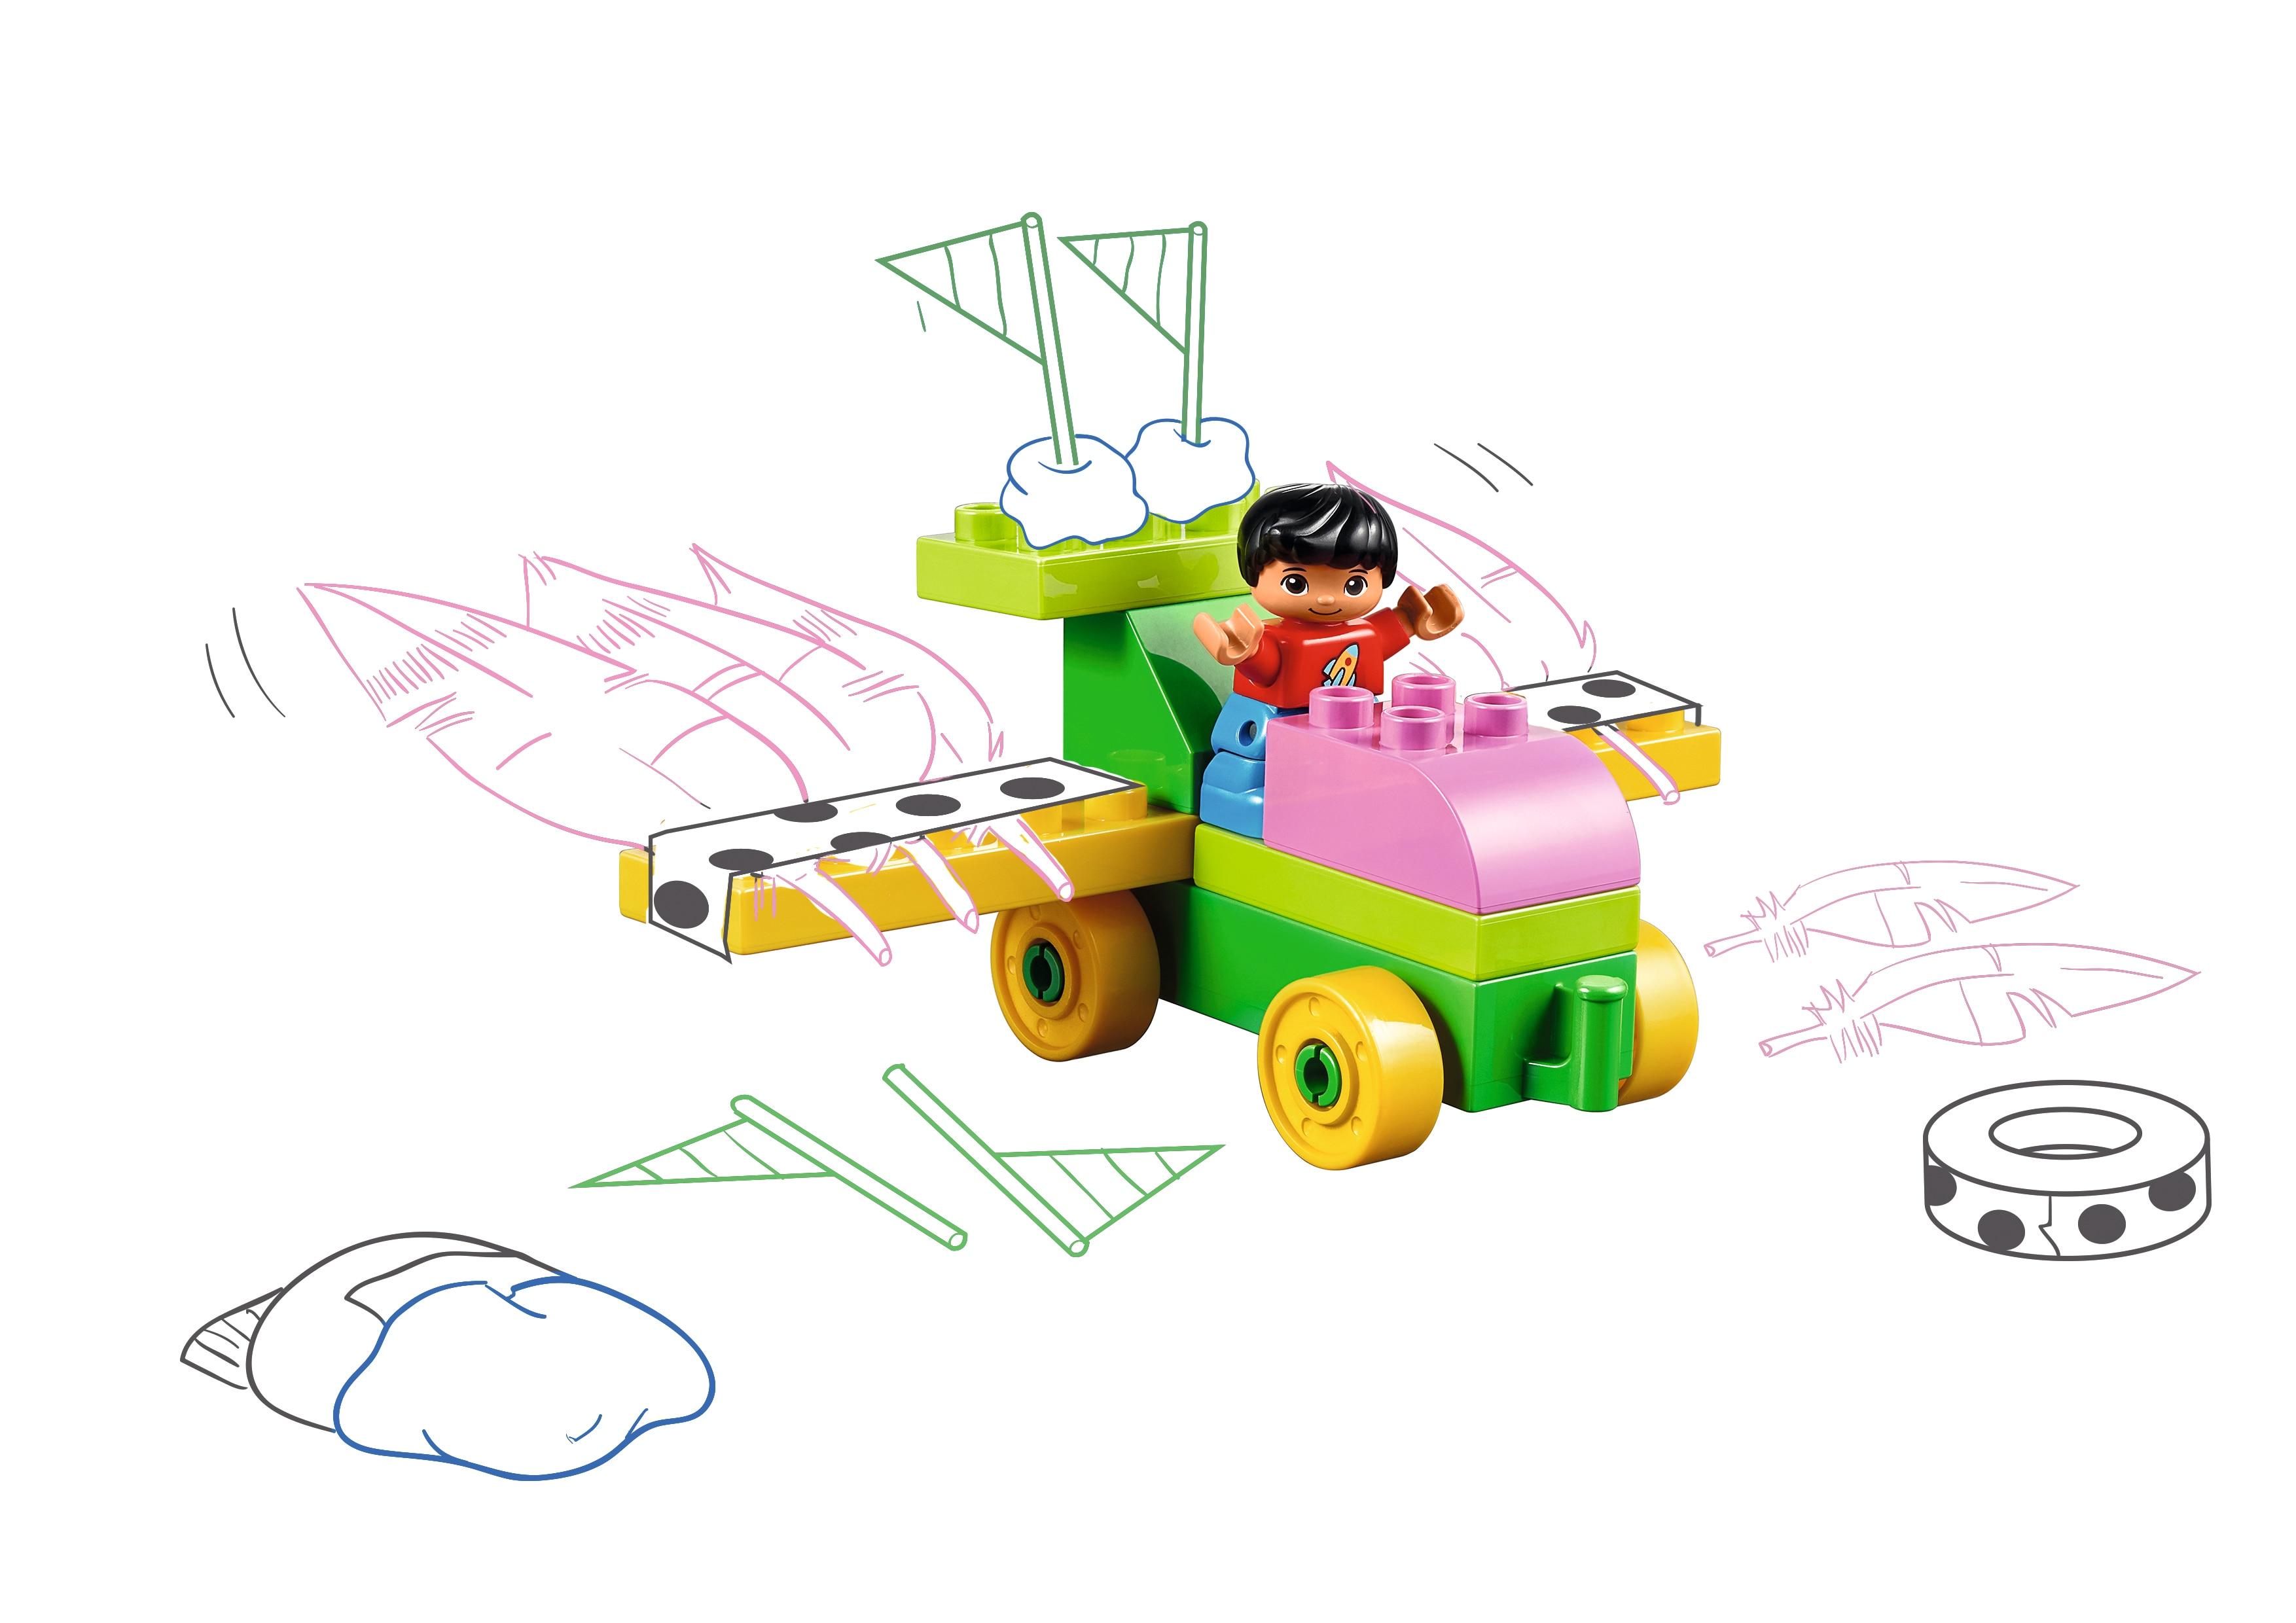 Dream Car Preschool Lesson | Maker With STEAM Park | LEGO Education